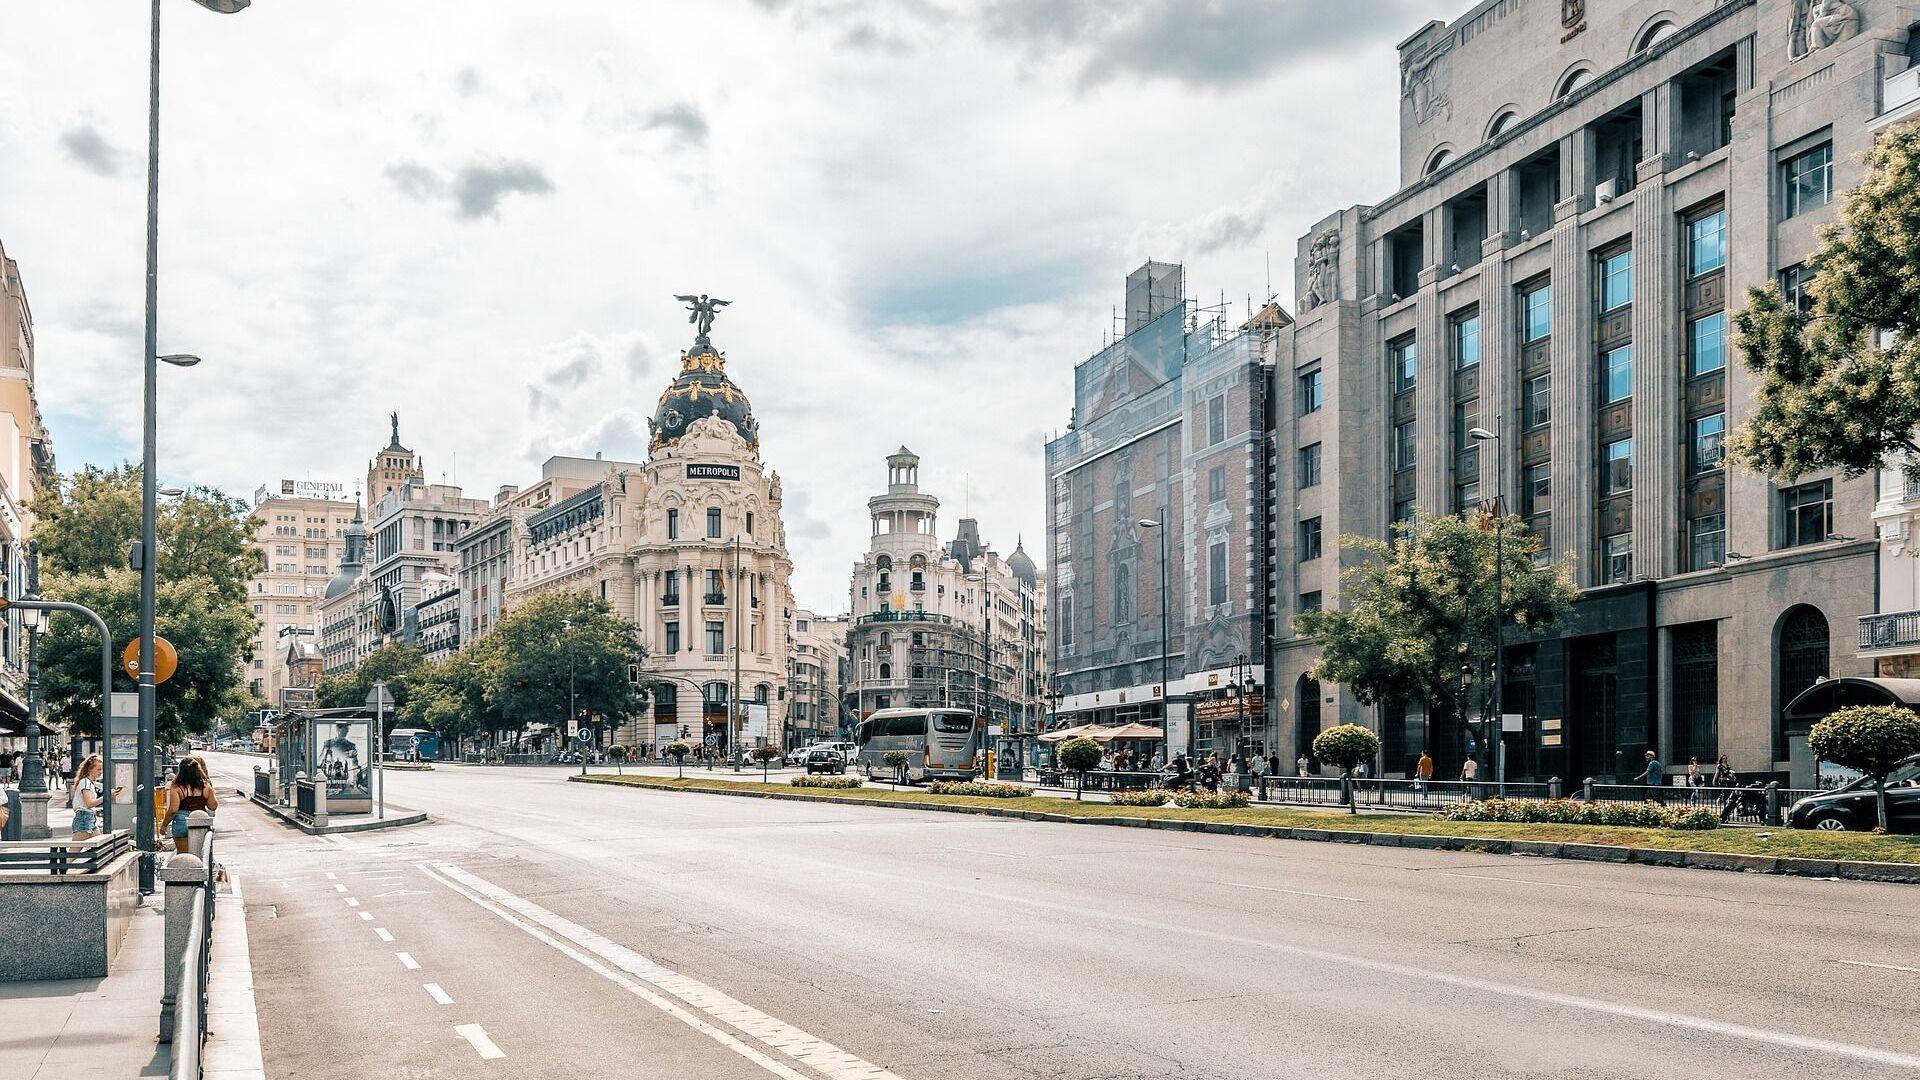 Ciudad de Madrid - Sputnik Mundo, 1920, 14.04.2021